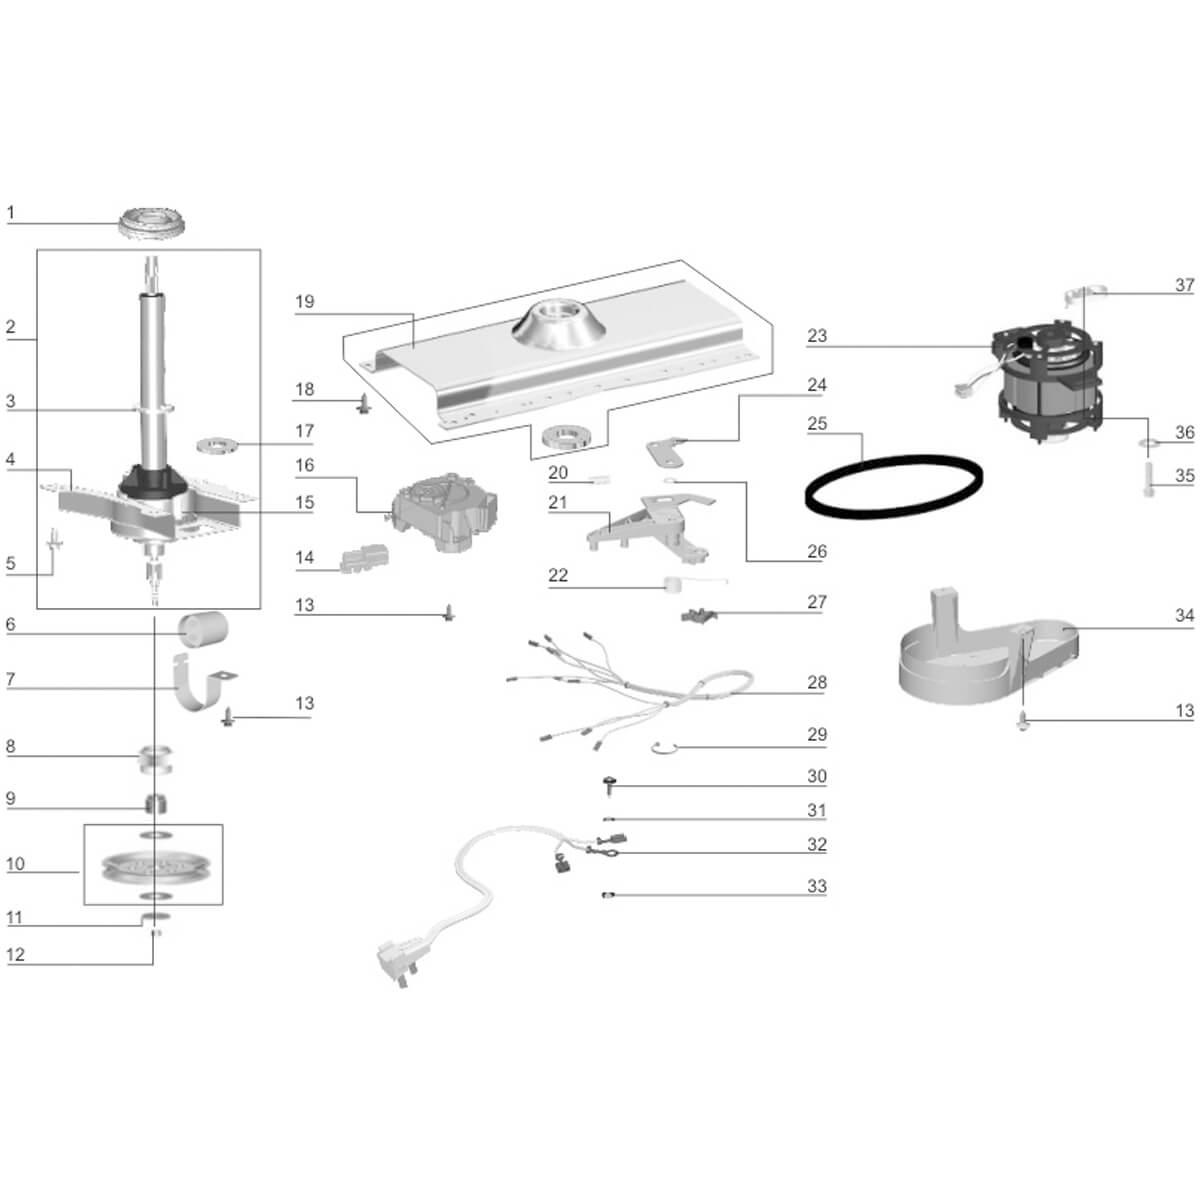 Arruela Engaste Rolamento Lavadora Electrolux - 61290897